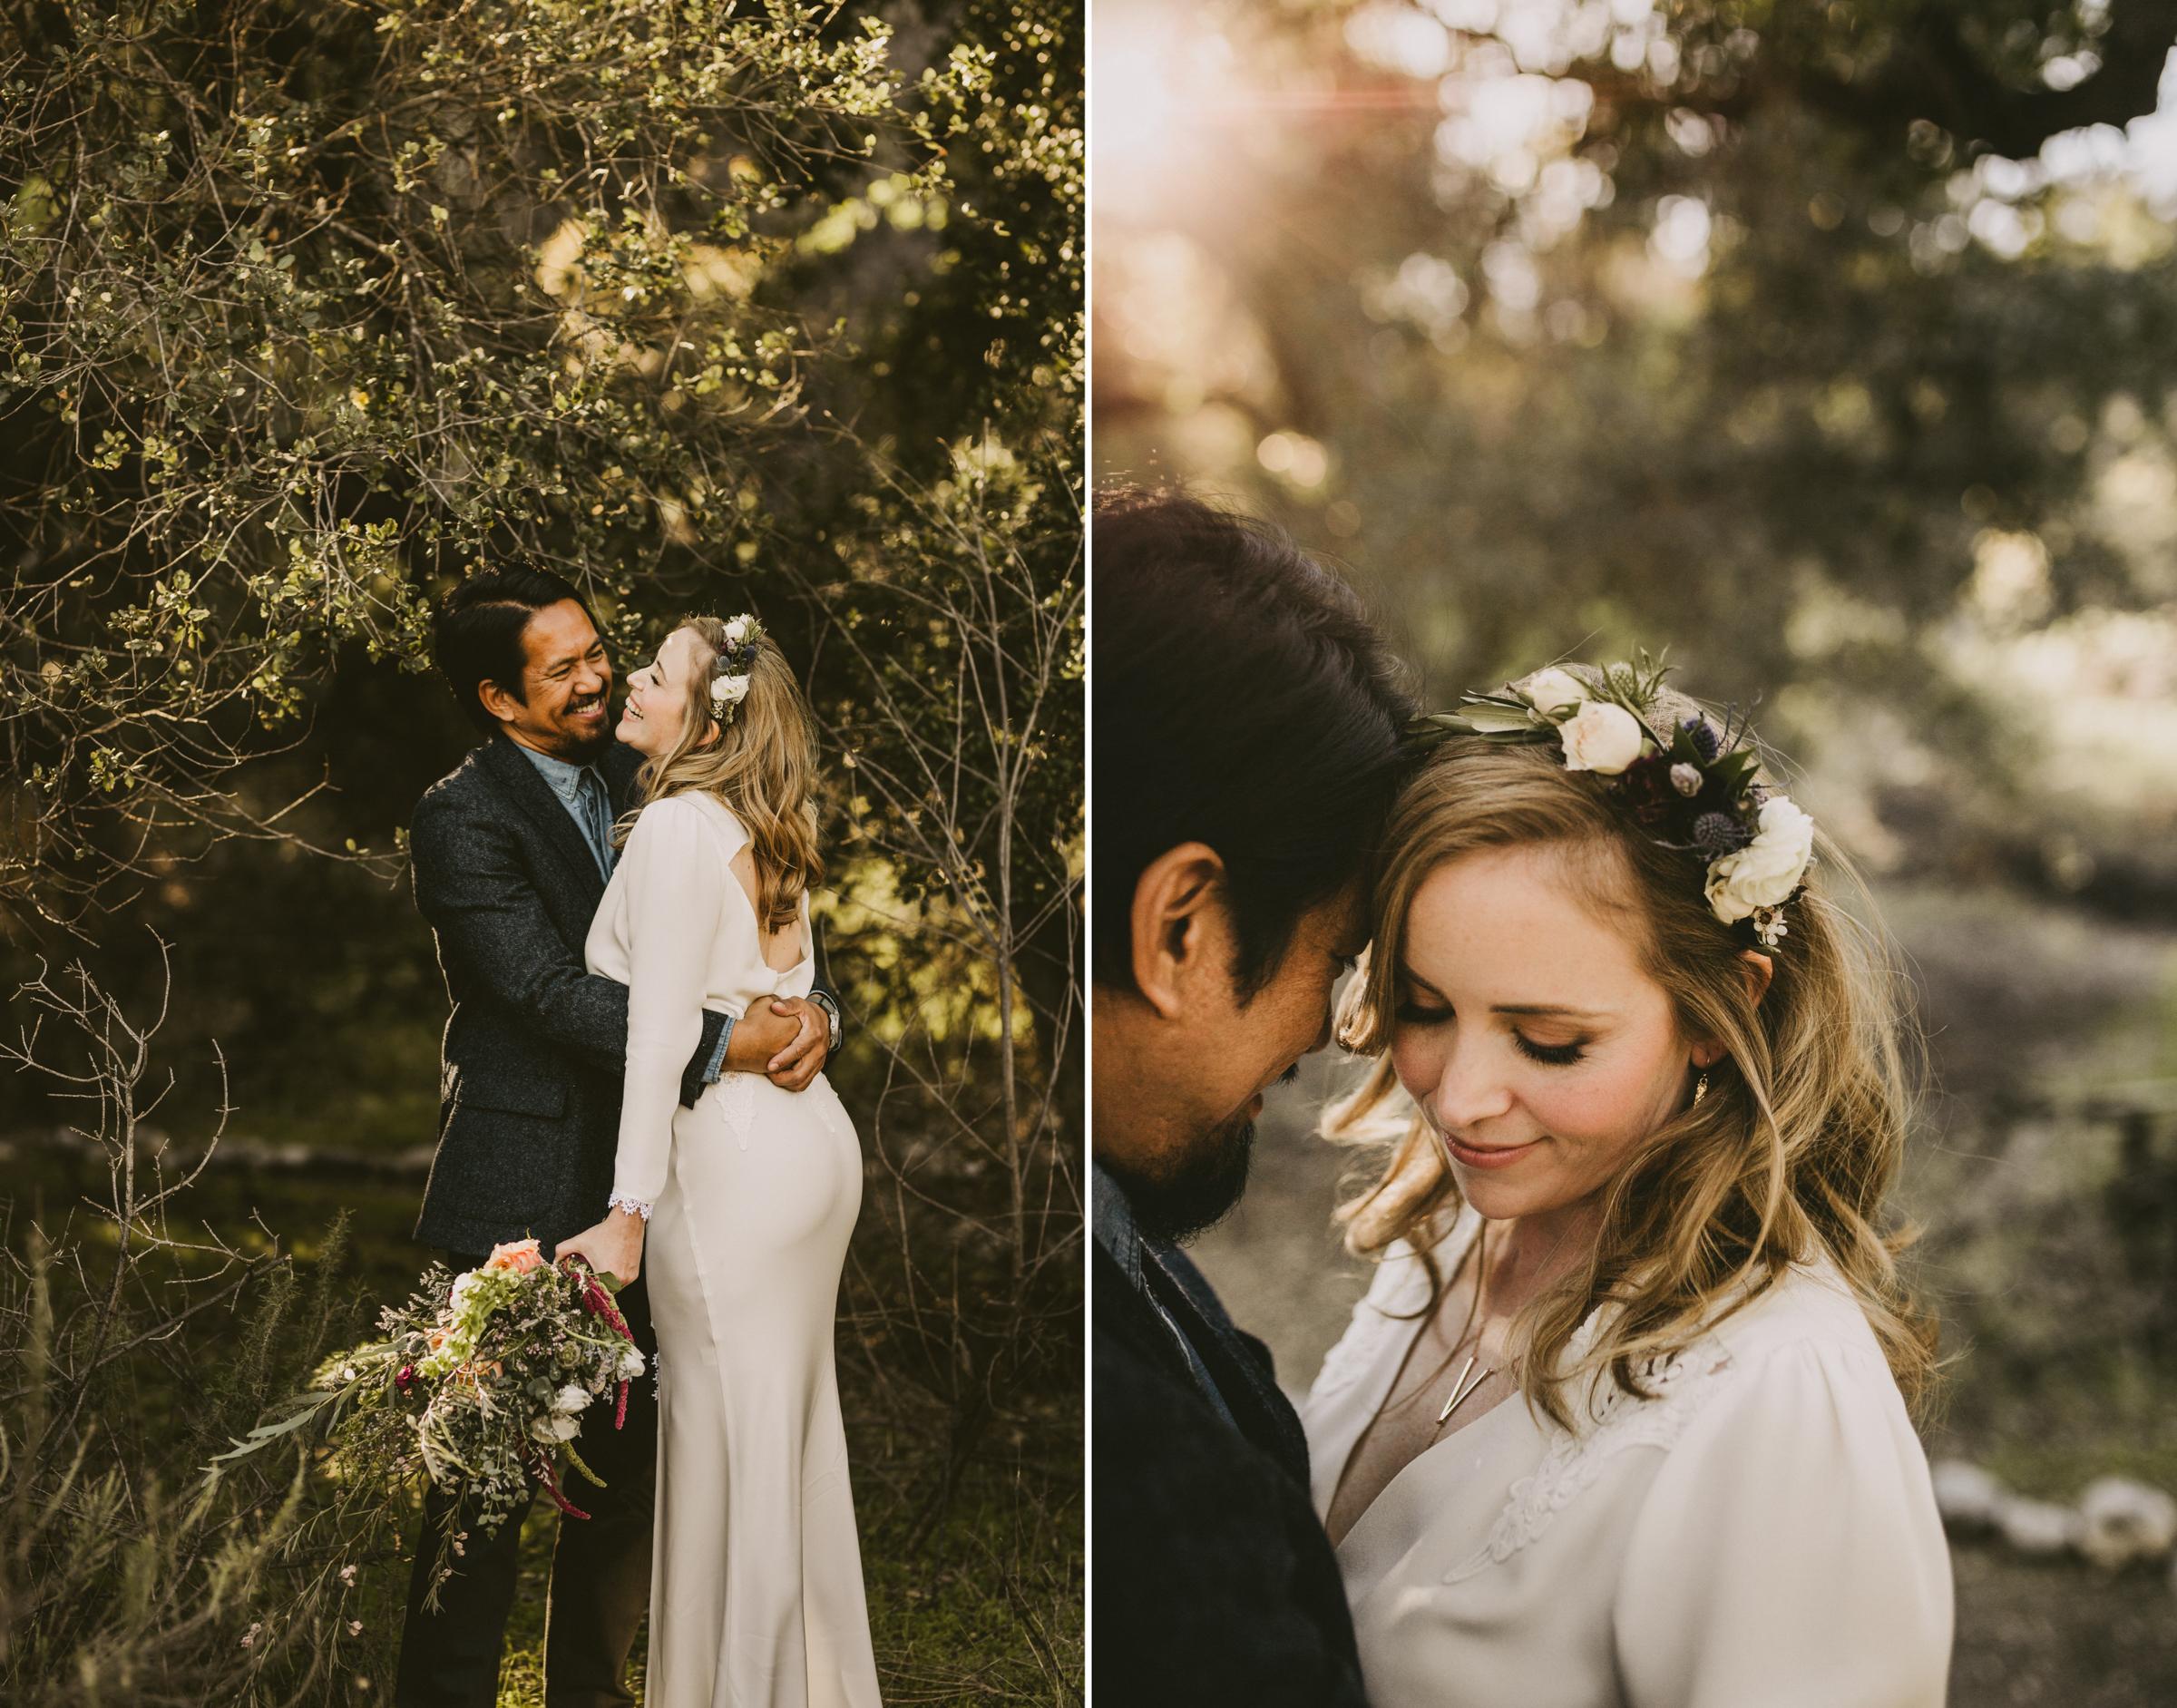 ©Isaiah + Taylor Photography - Intimate Elopement, Eaton Canyon, Los Angeles Wedding Photographer-24.jpg